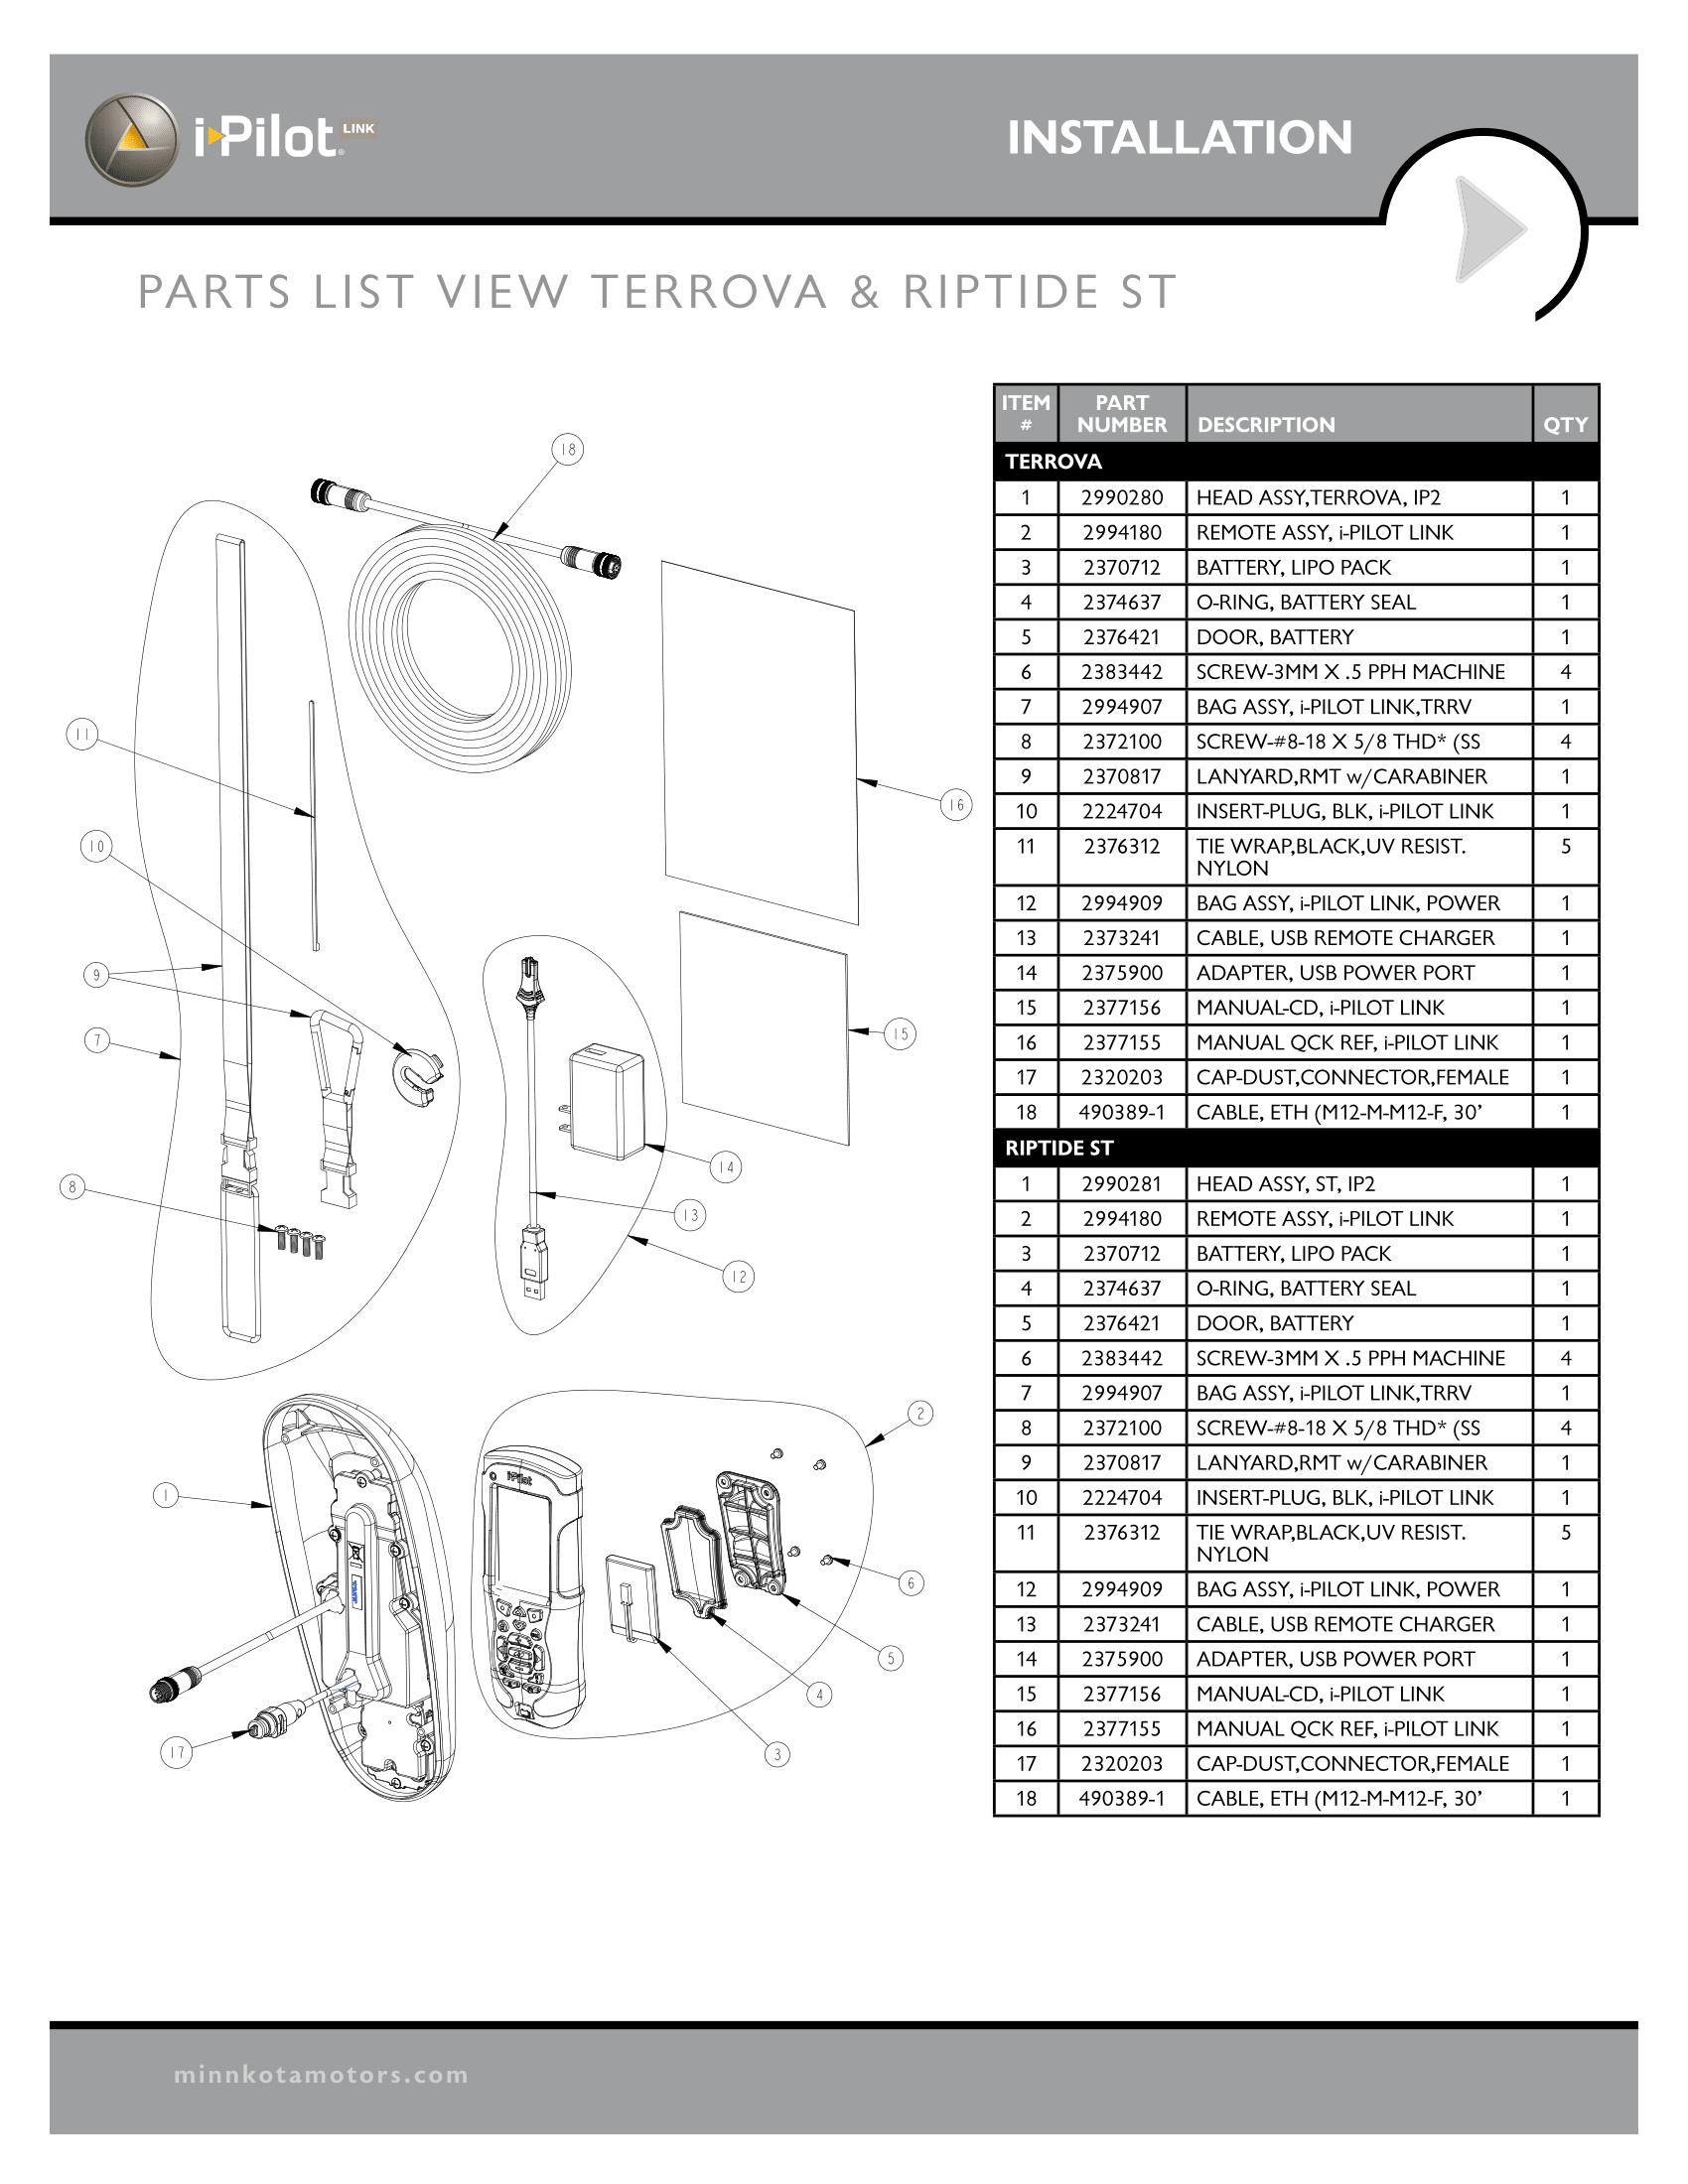 2014-mk-i-pilot-link-1.png